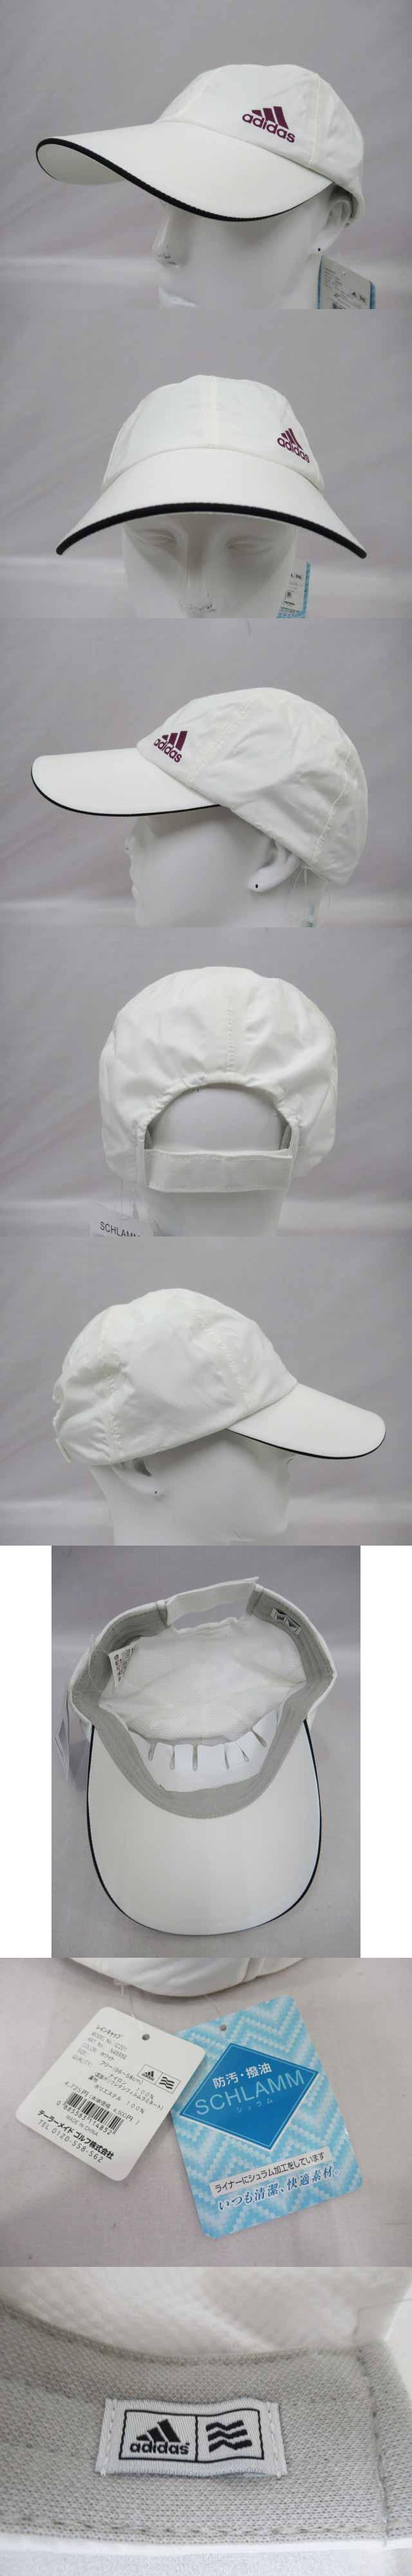 3b2f0b4a48dc3 TaylorMade Golf Logo print rain cap hat F white   brand old clothes  bektoru